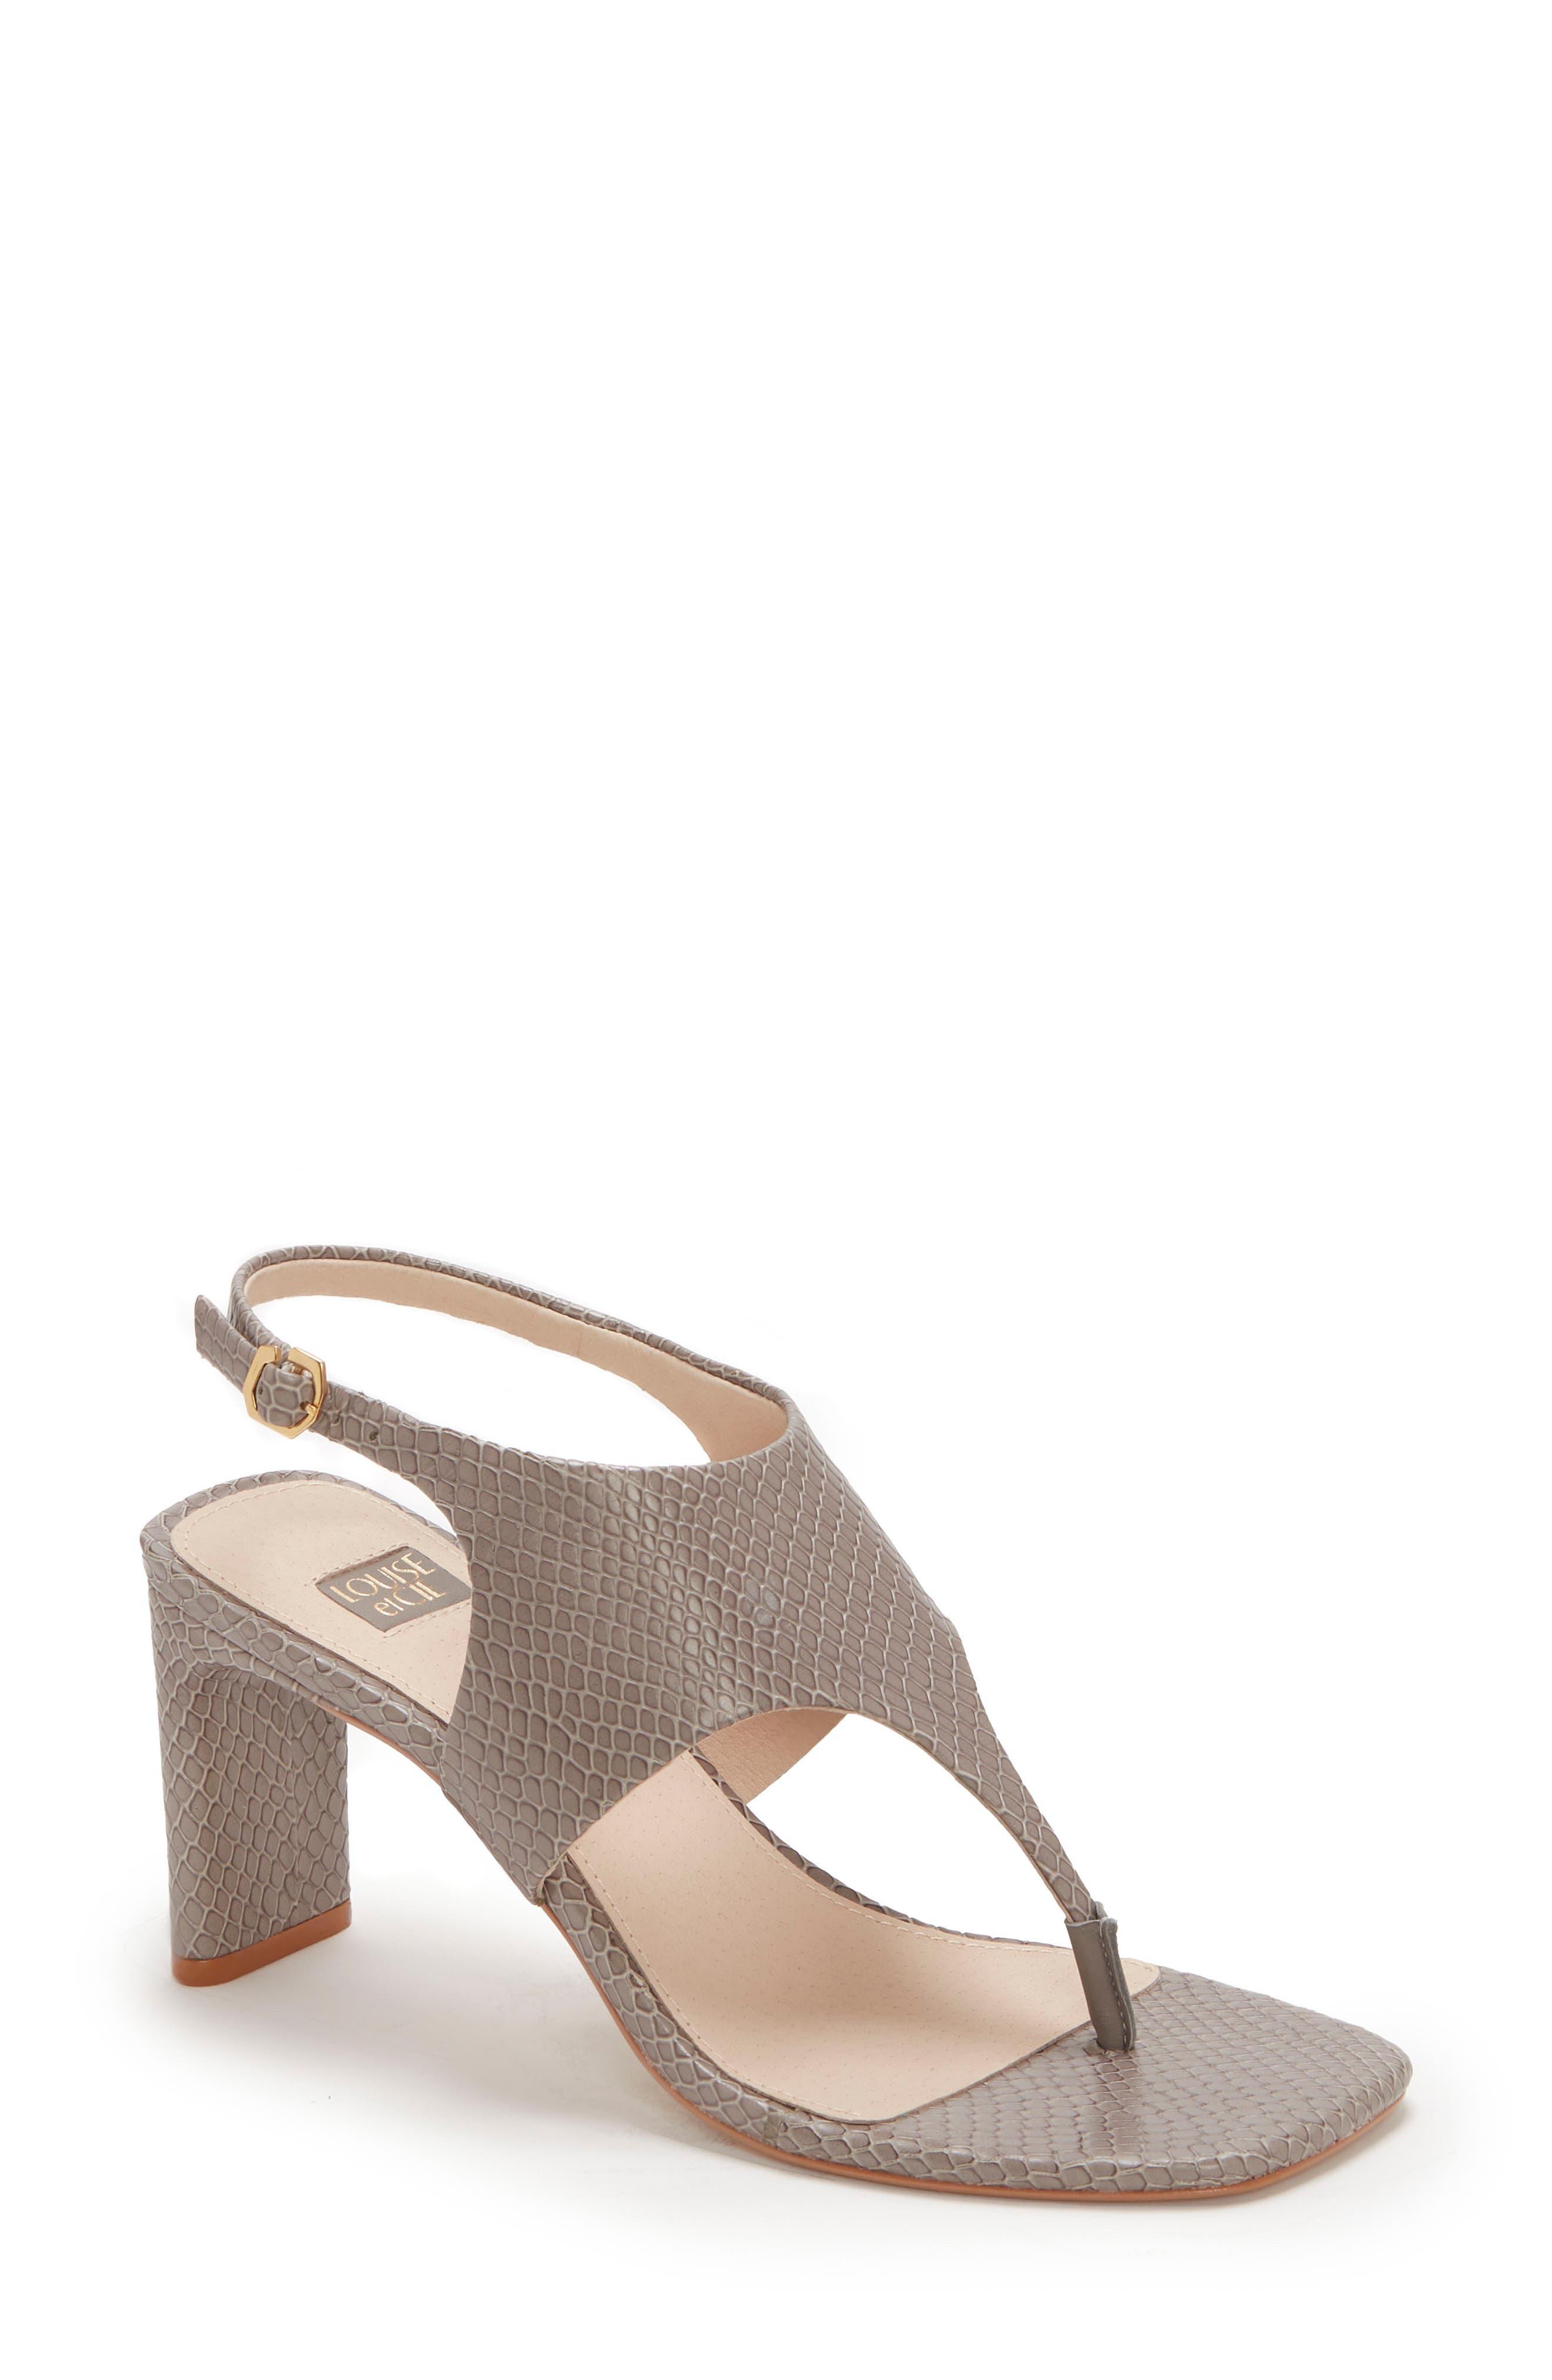 Lalo Thong Sandal